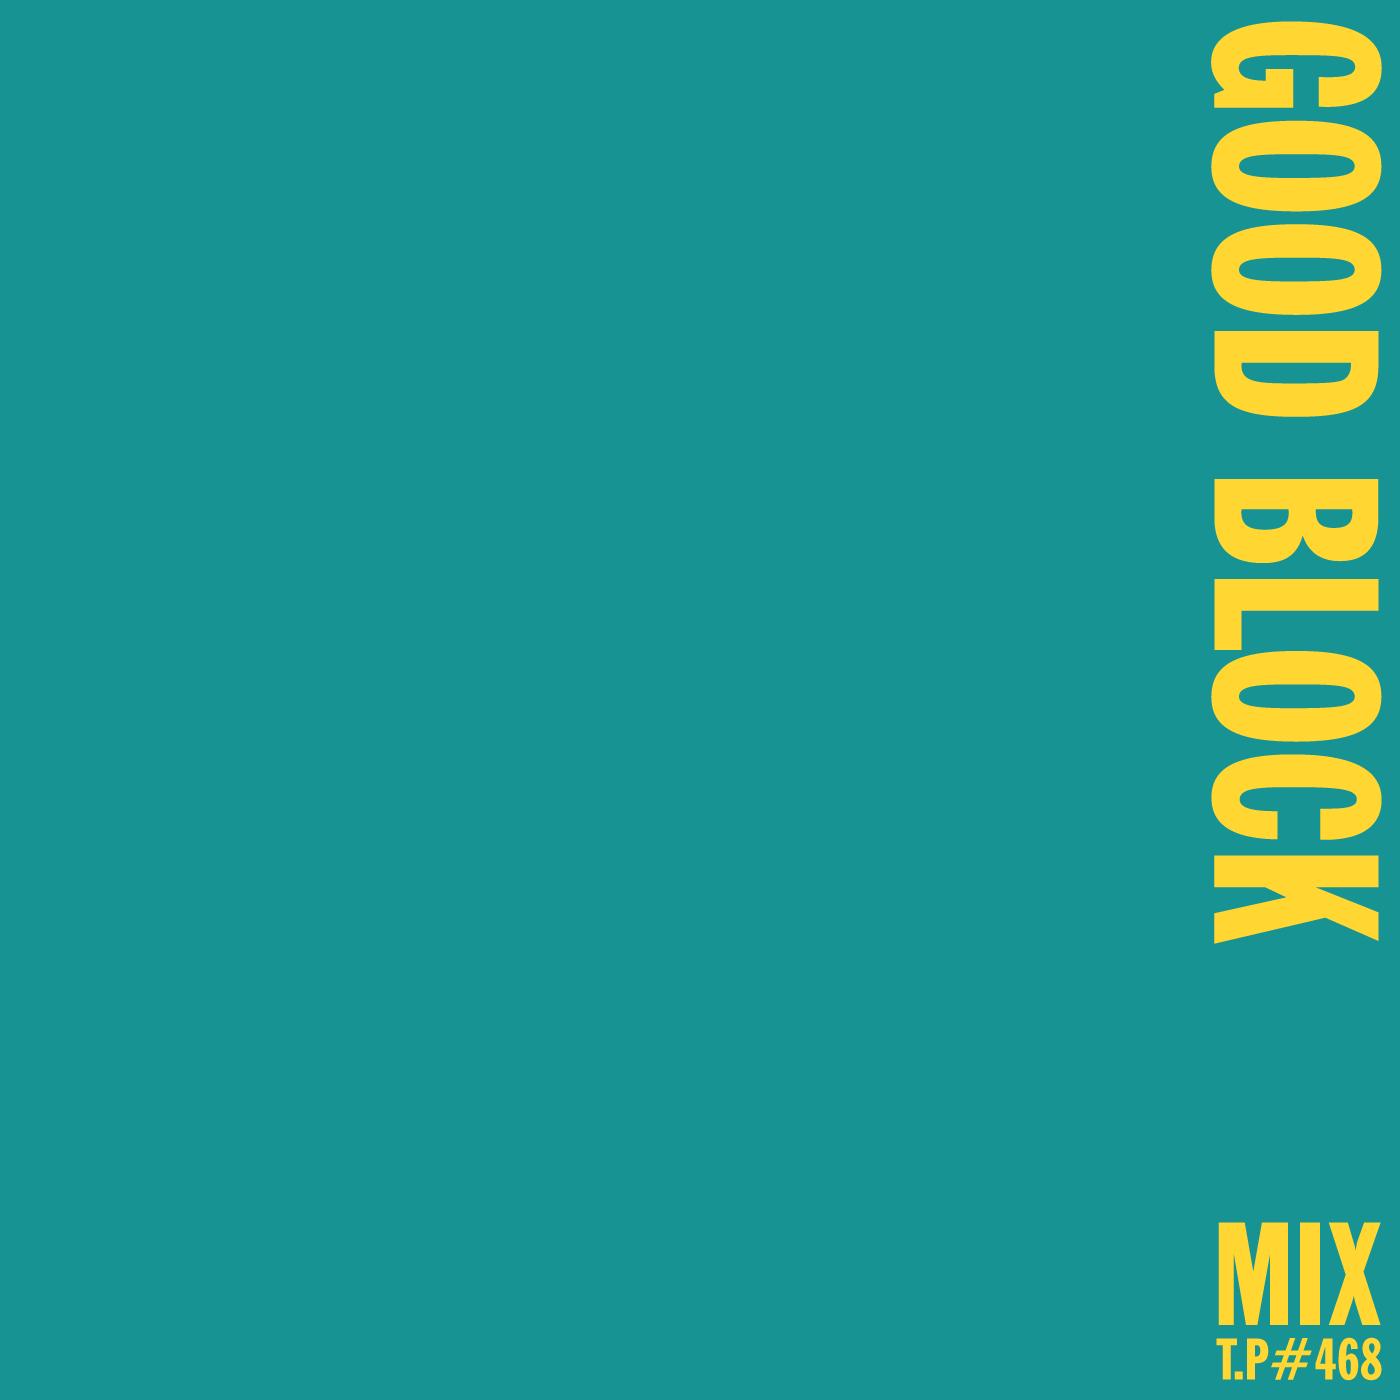 Selvagem, DJ Vegetable, Good Block, Party, 5 Miles, Disco, World, Ethno Beat, Mix